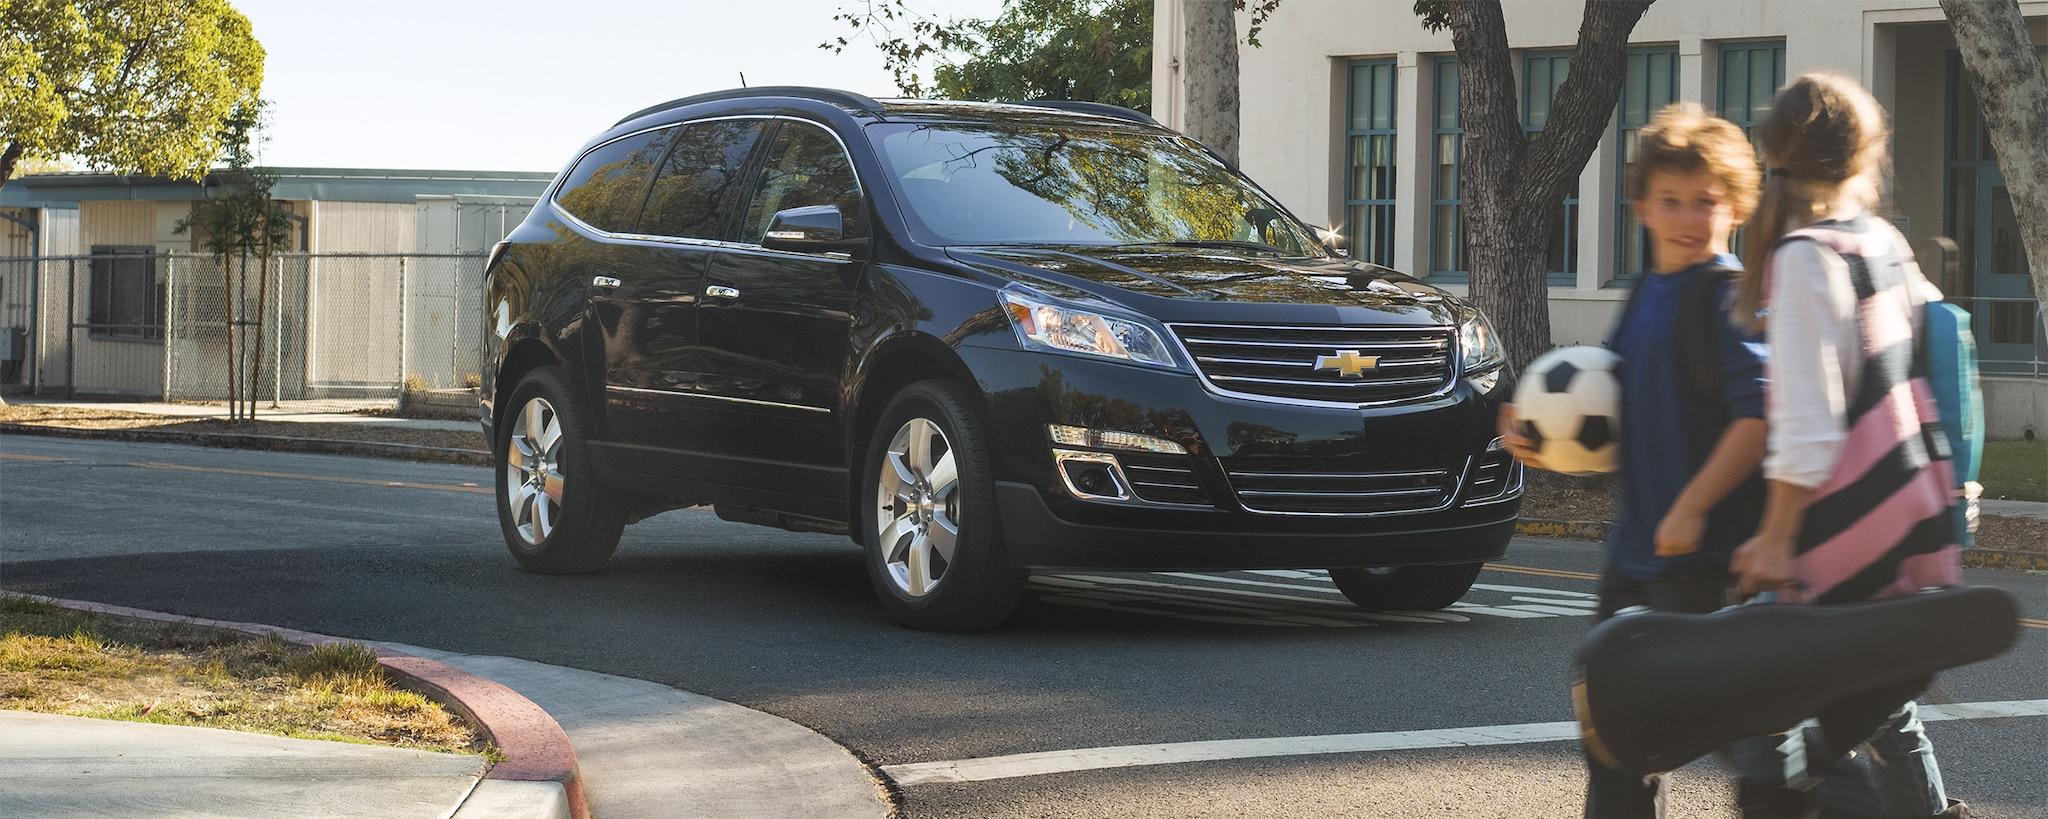 Programa de descuento de Chevrolet para educadores